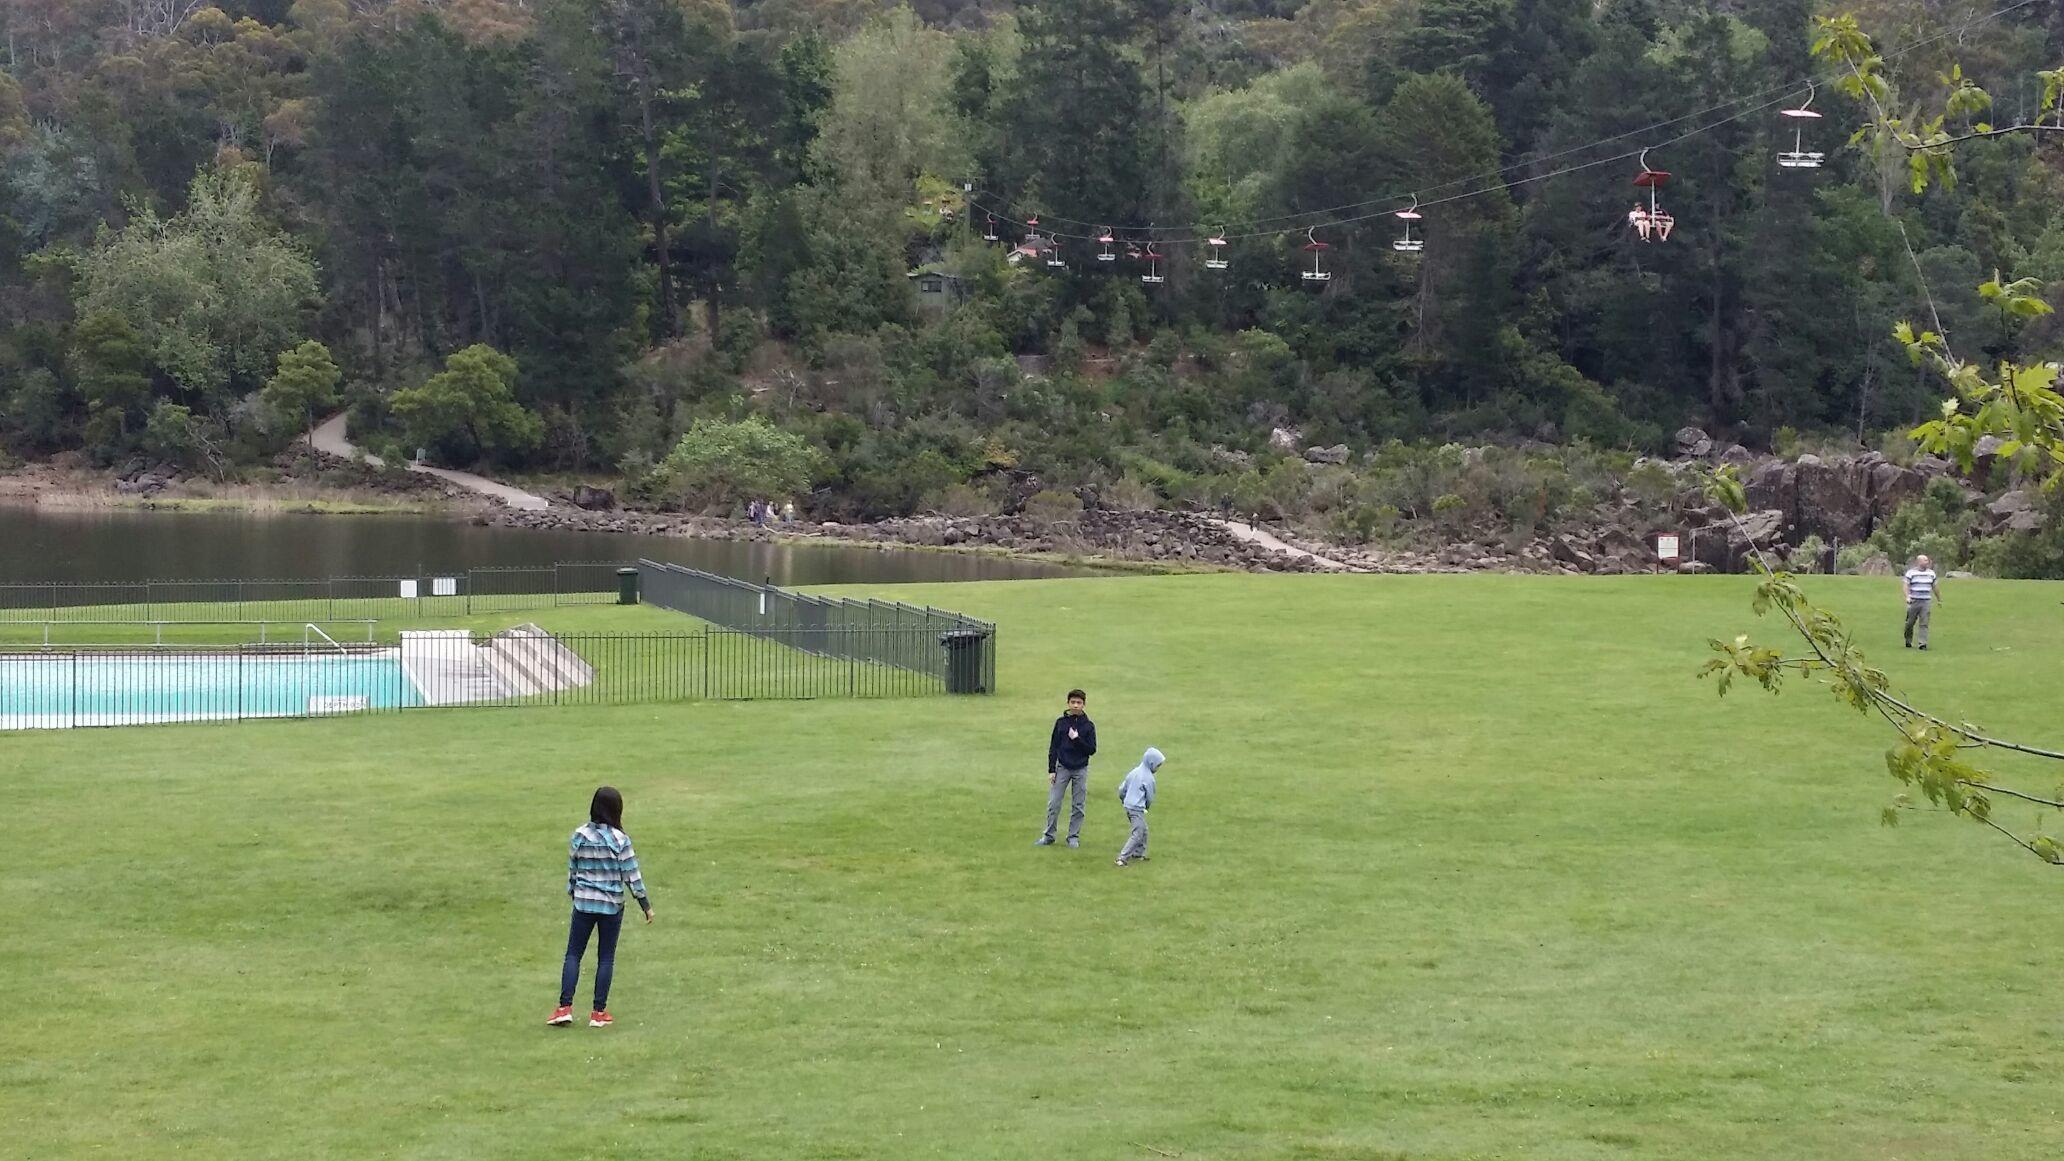 Family playing Frisbee at Cataract's Gouge, Launceston, Tasmania.